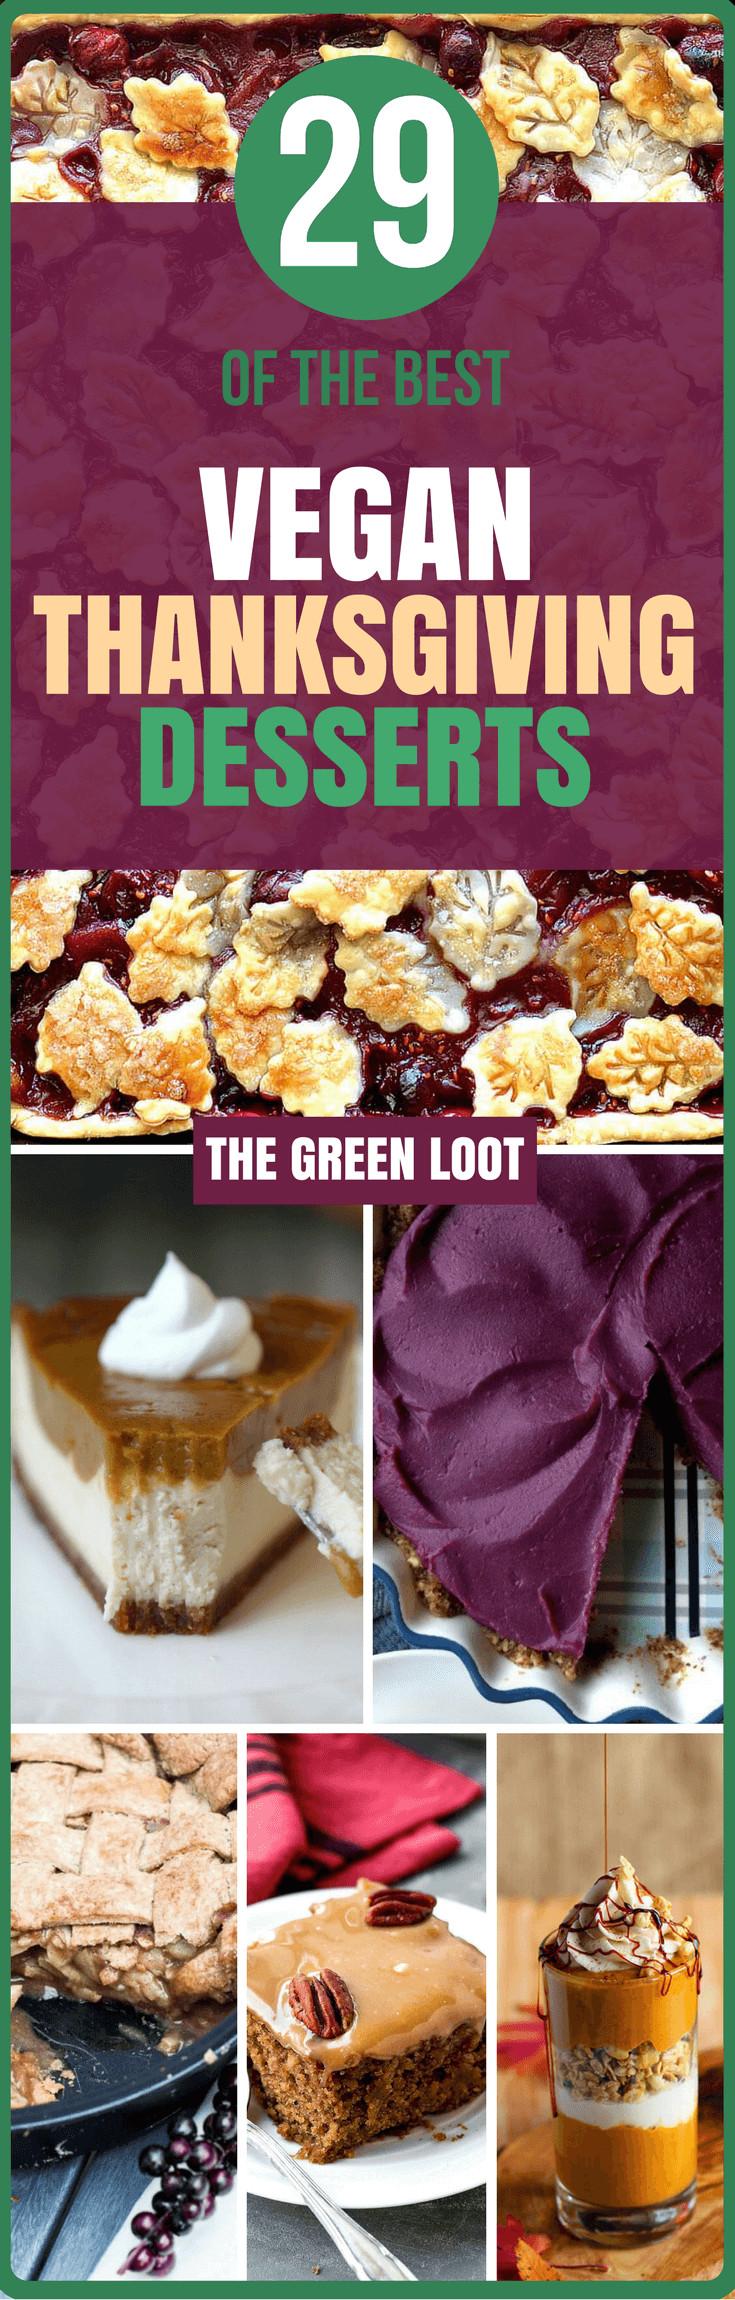 Vegan Thanksgiving Dessert  The Best 29 Vegan Thanksgiving Dessert Recipes The Green